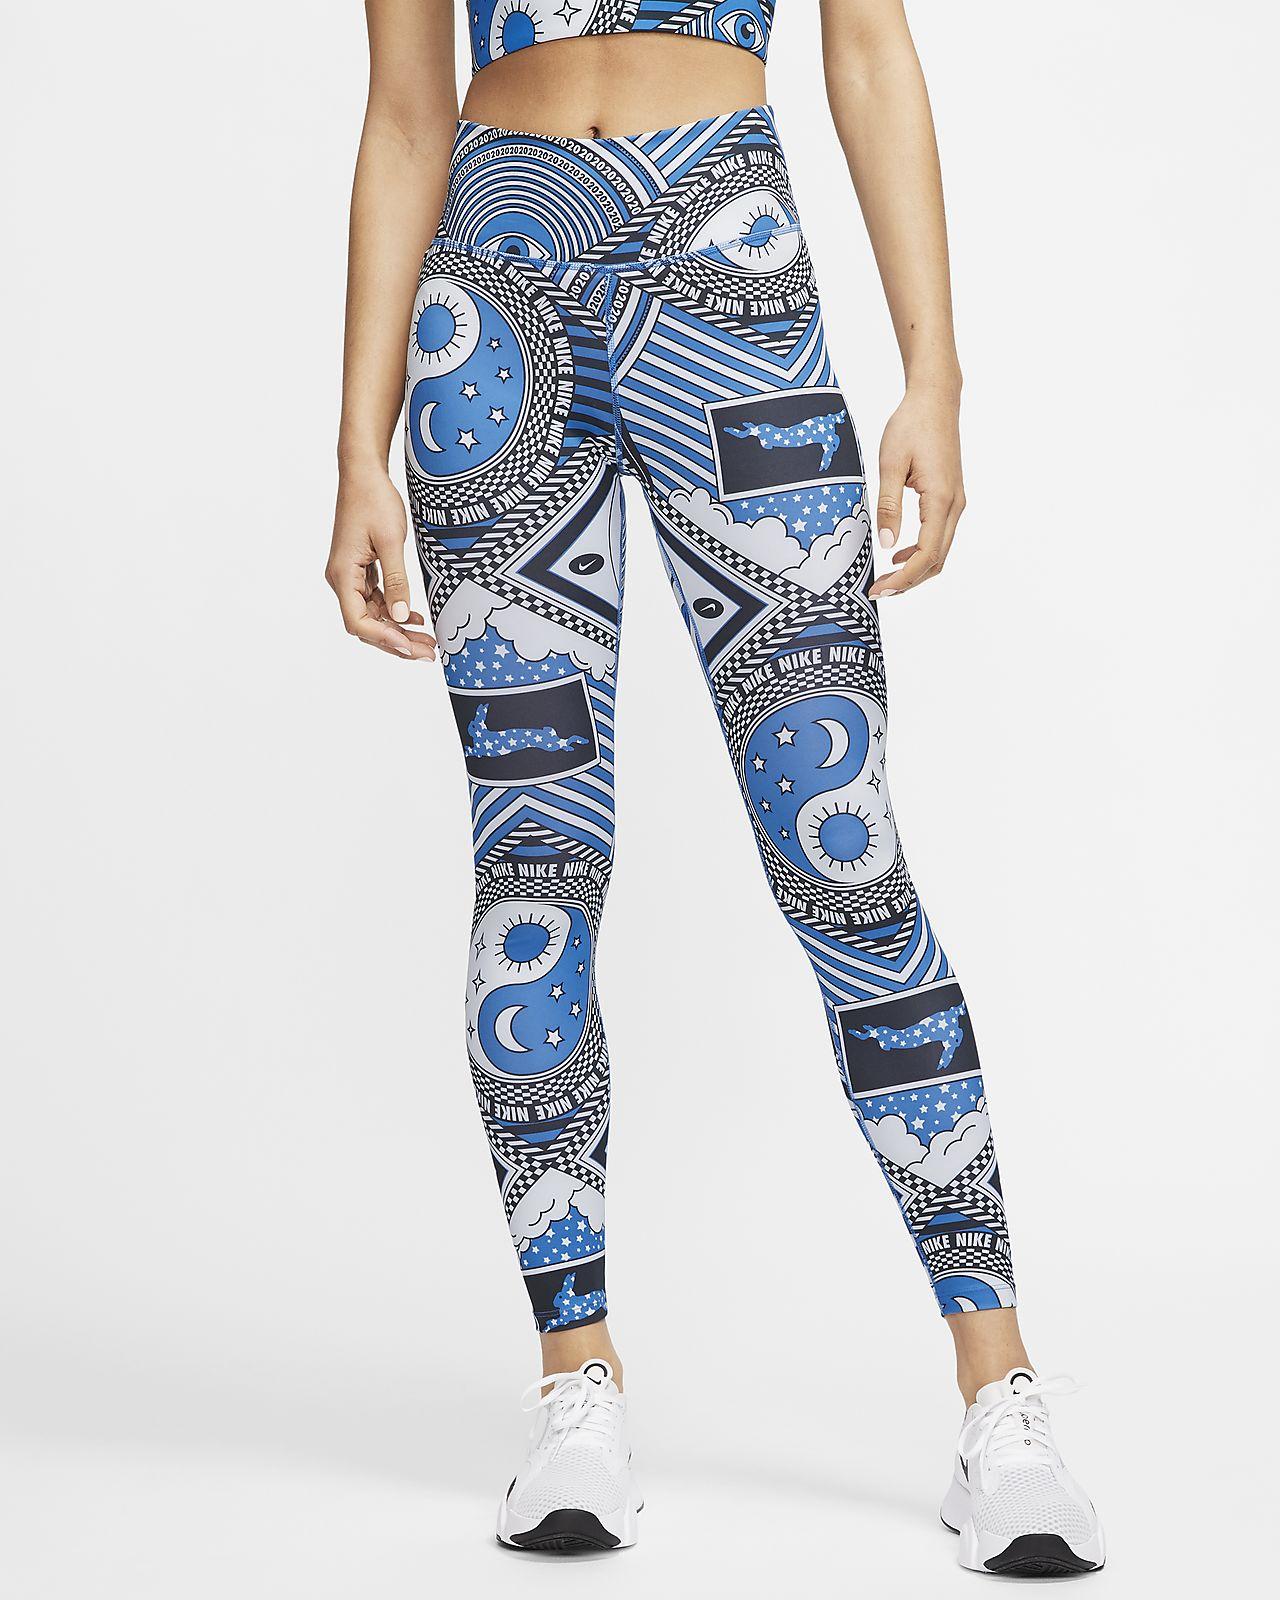 Nike One Women's Mid-Rise 7/8 Printed Leggings